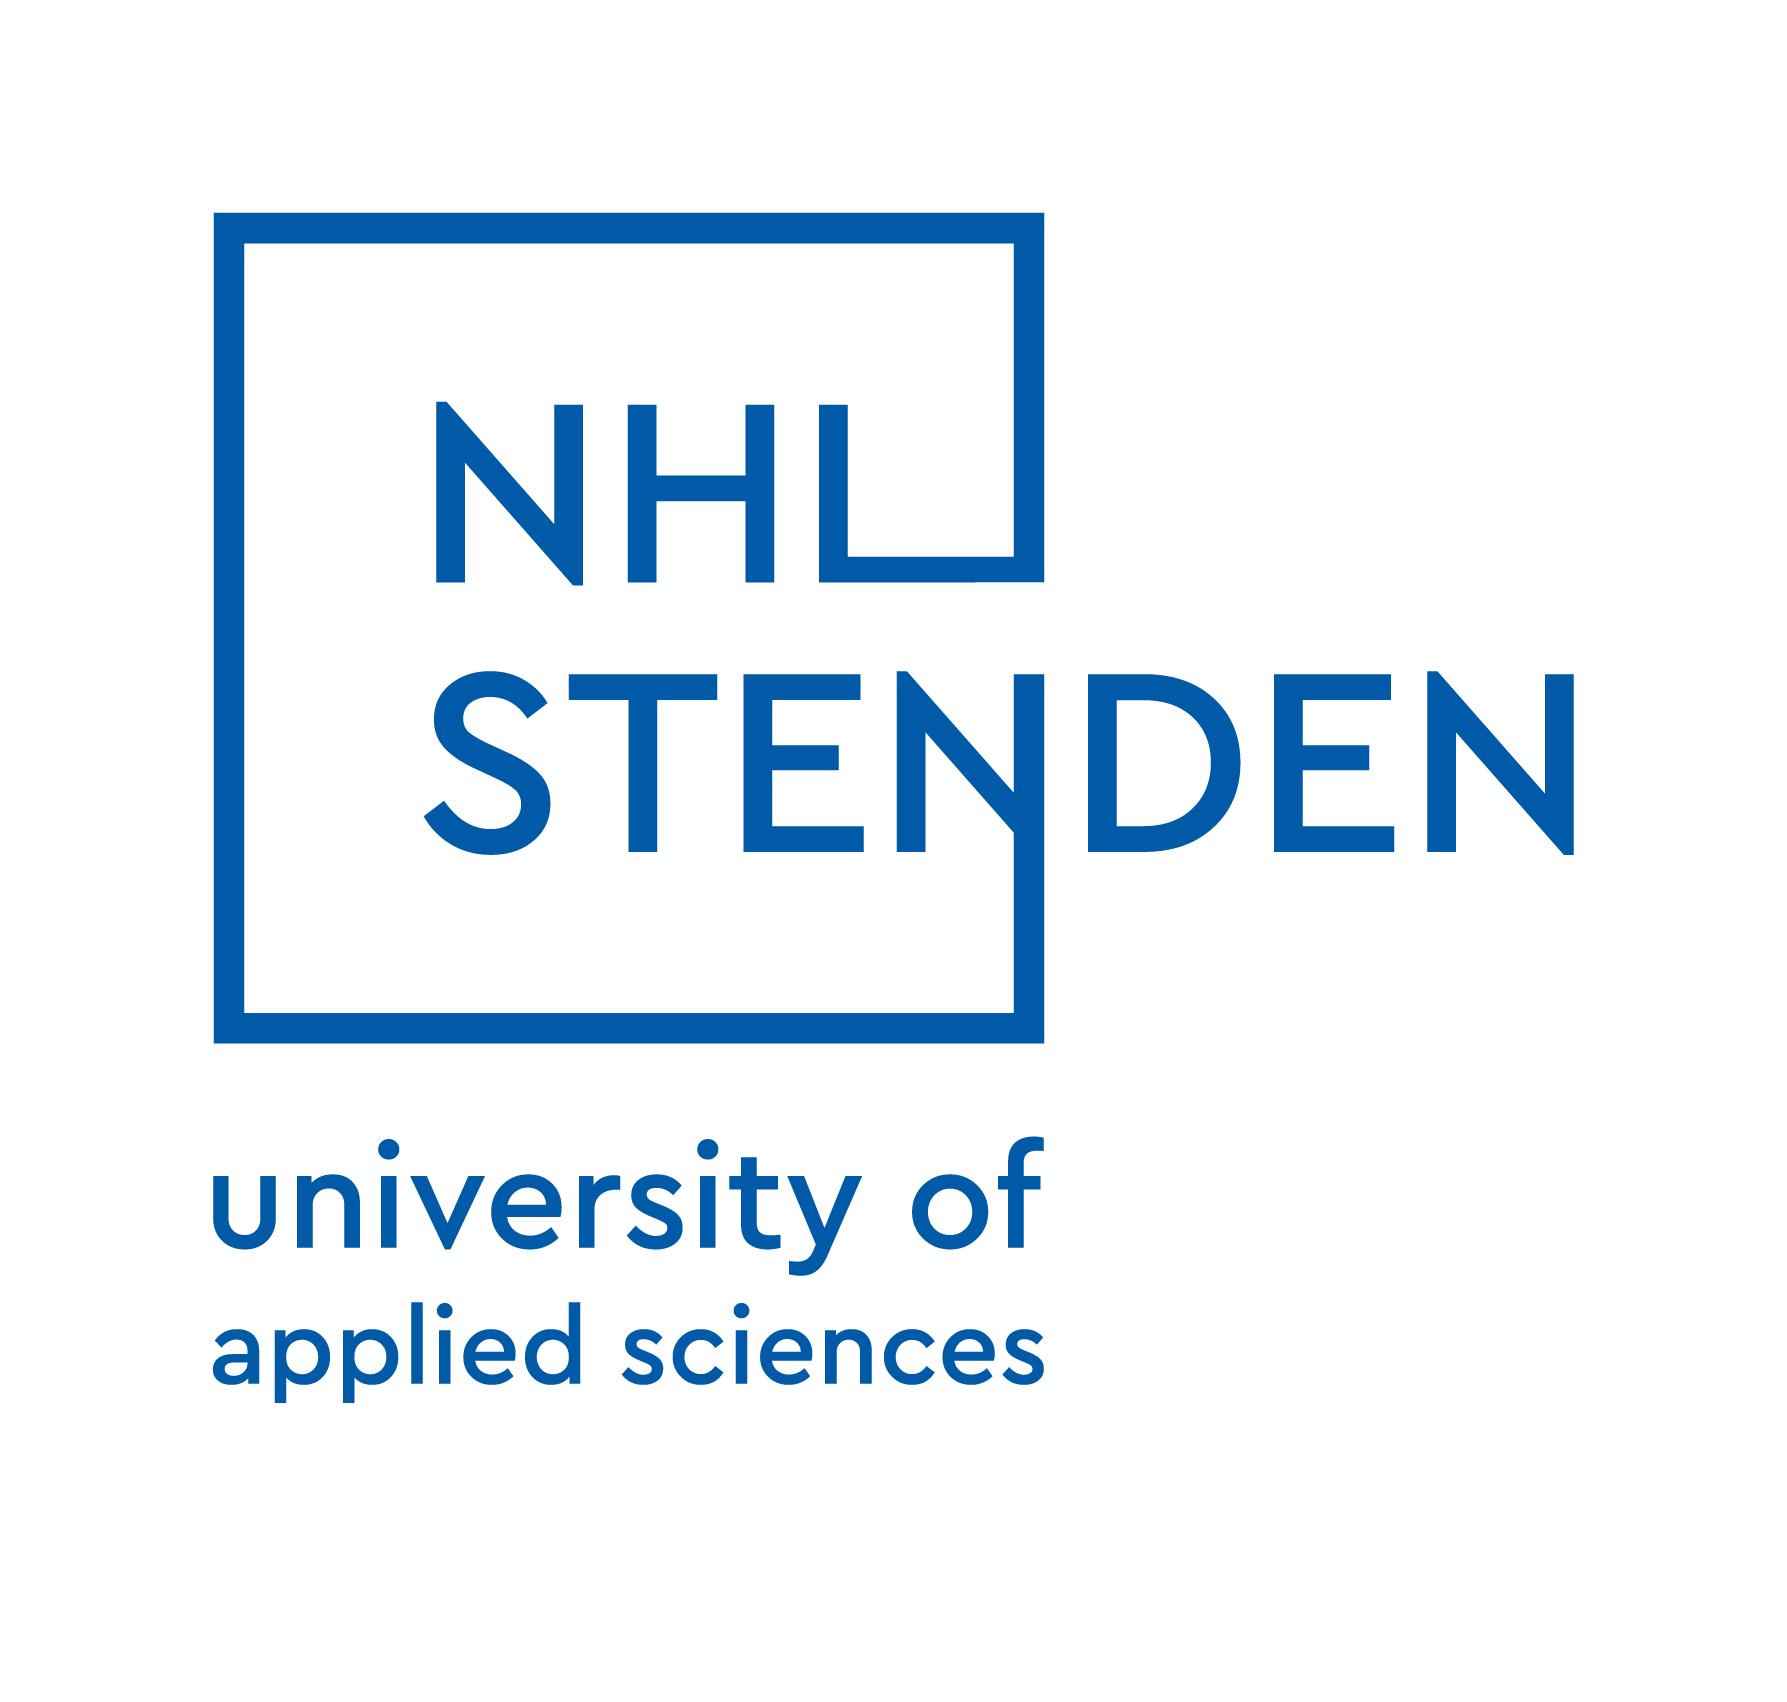 NHL Stenden University of Applied Sciences